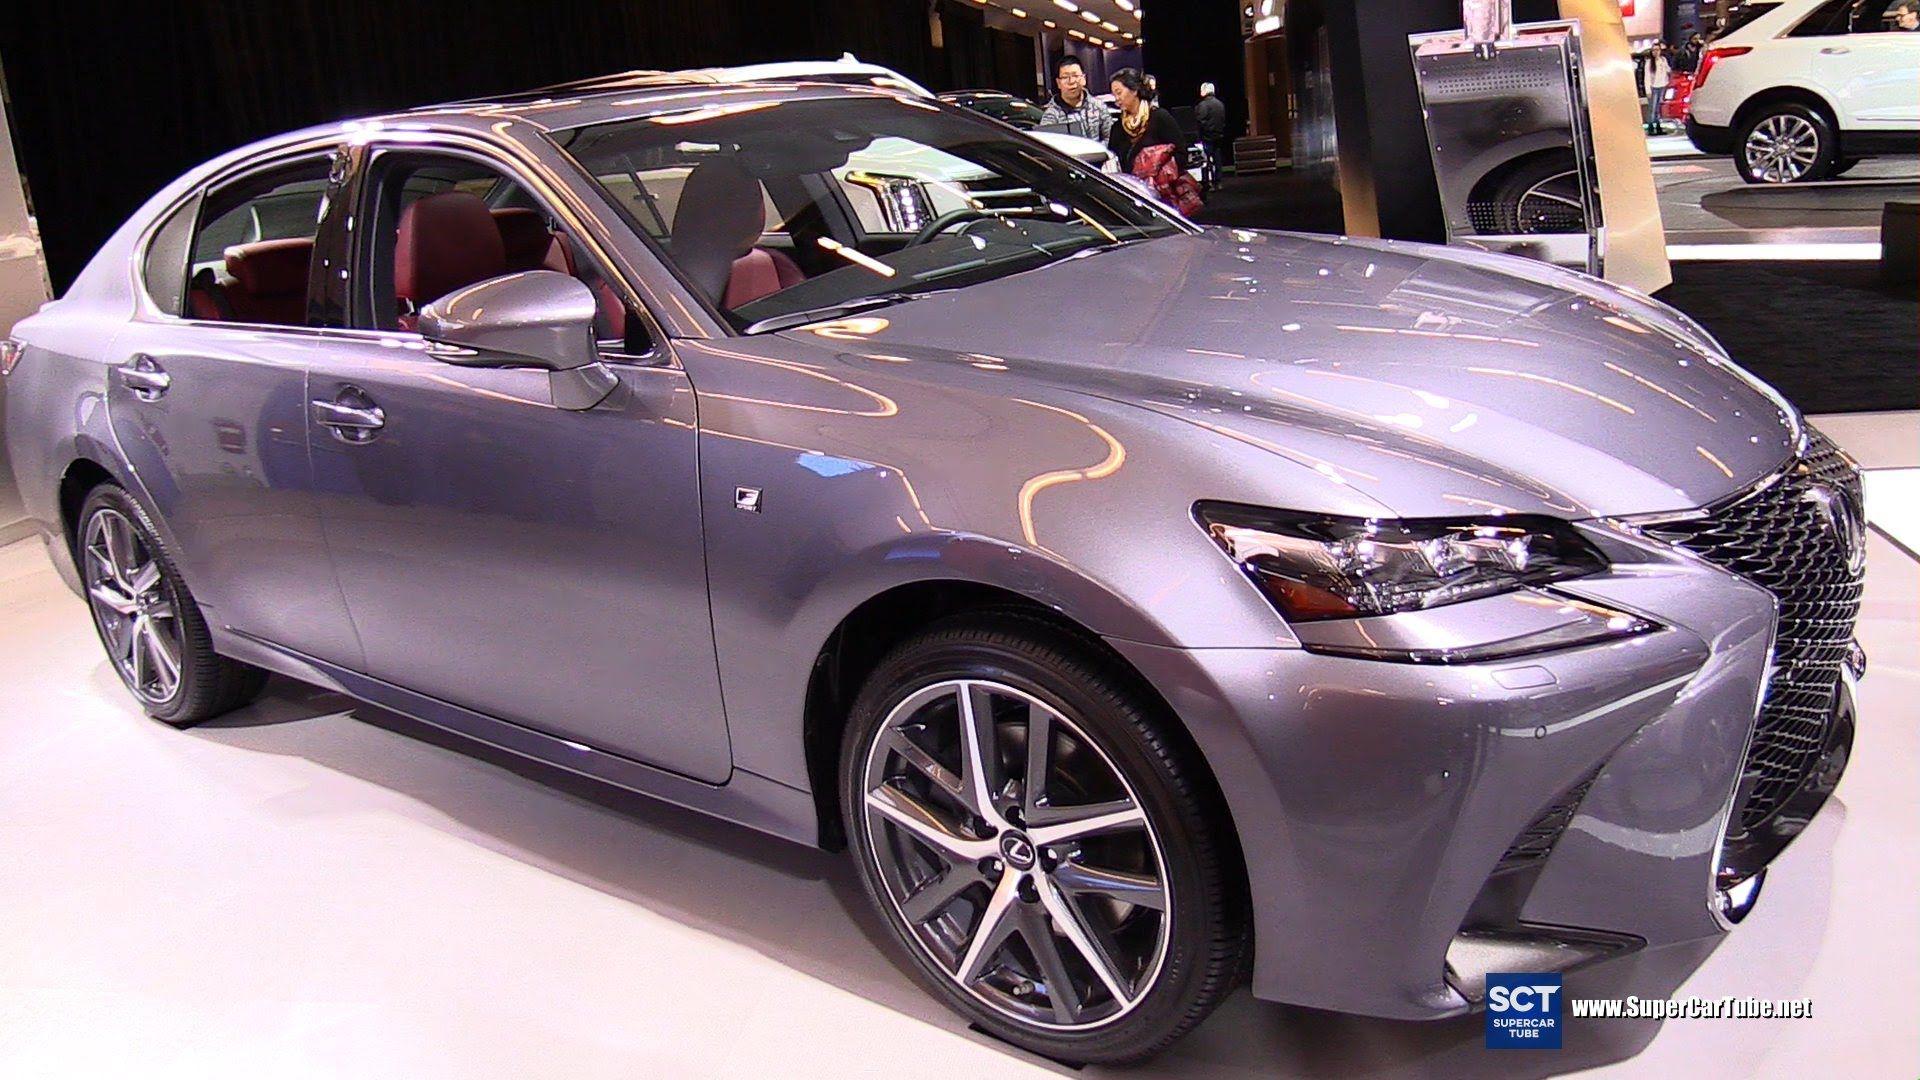 2016 Lexus Gs 350 F Sport Awd Exterior And Interior Walkaround 2016 Montreal Auto Show Lexus Europe Car Awd